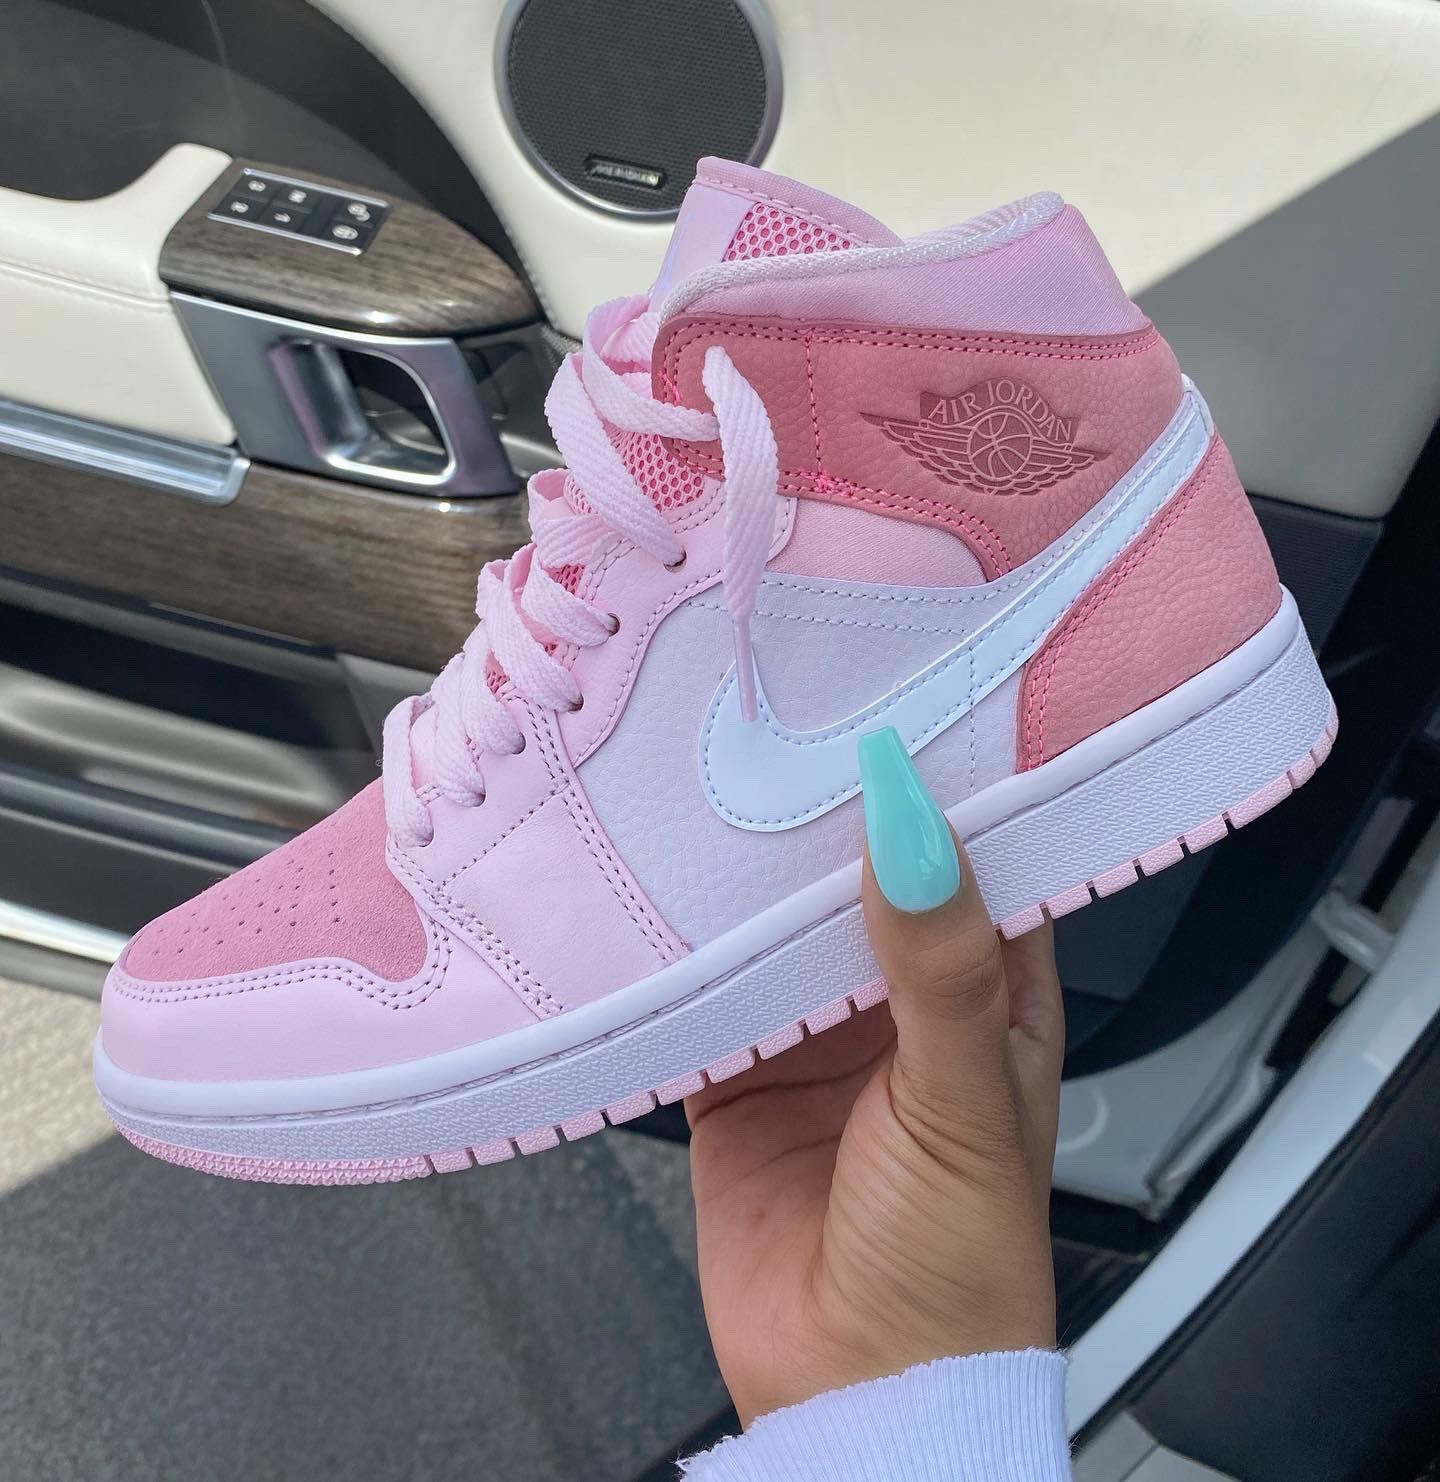 Nike on Twitter | Cute nike shoes, Jordan shoes girls, Cute sneakers